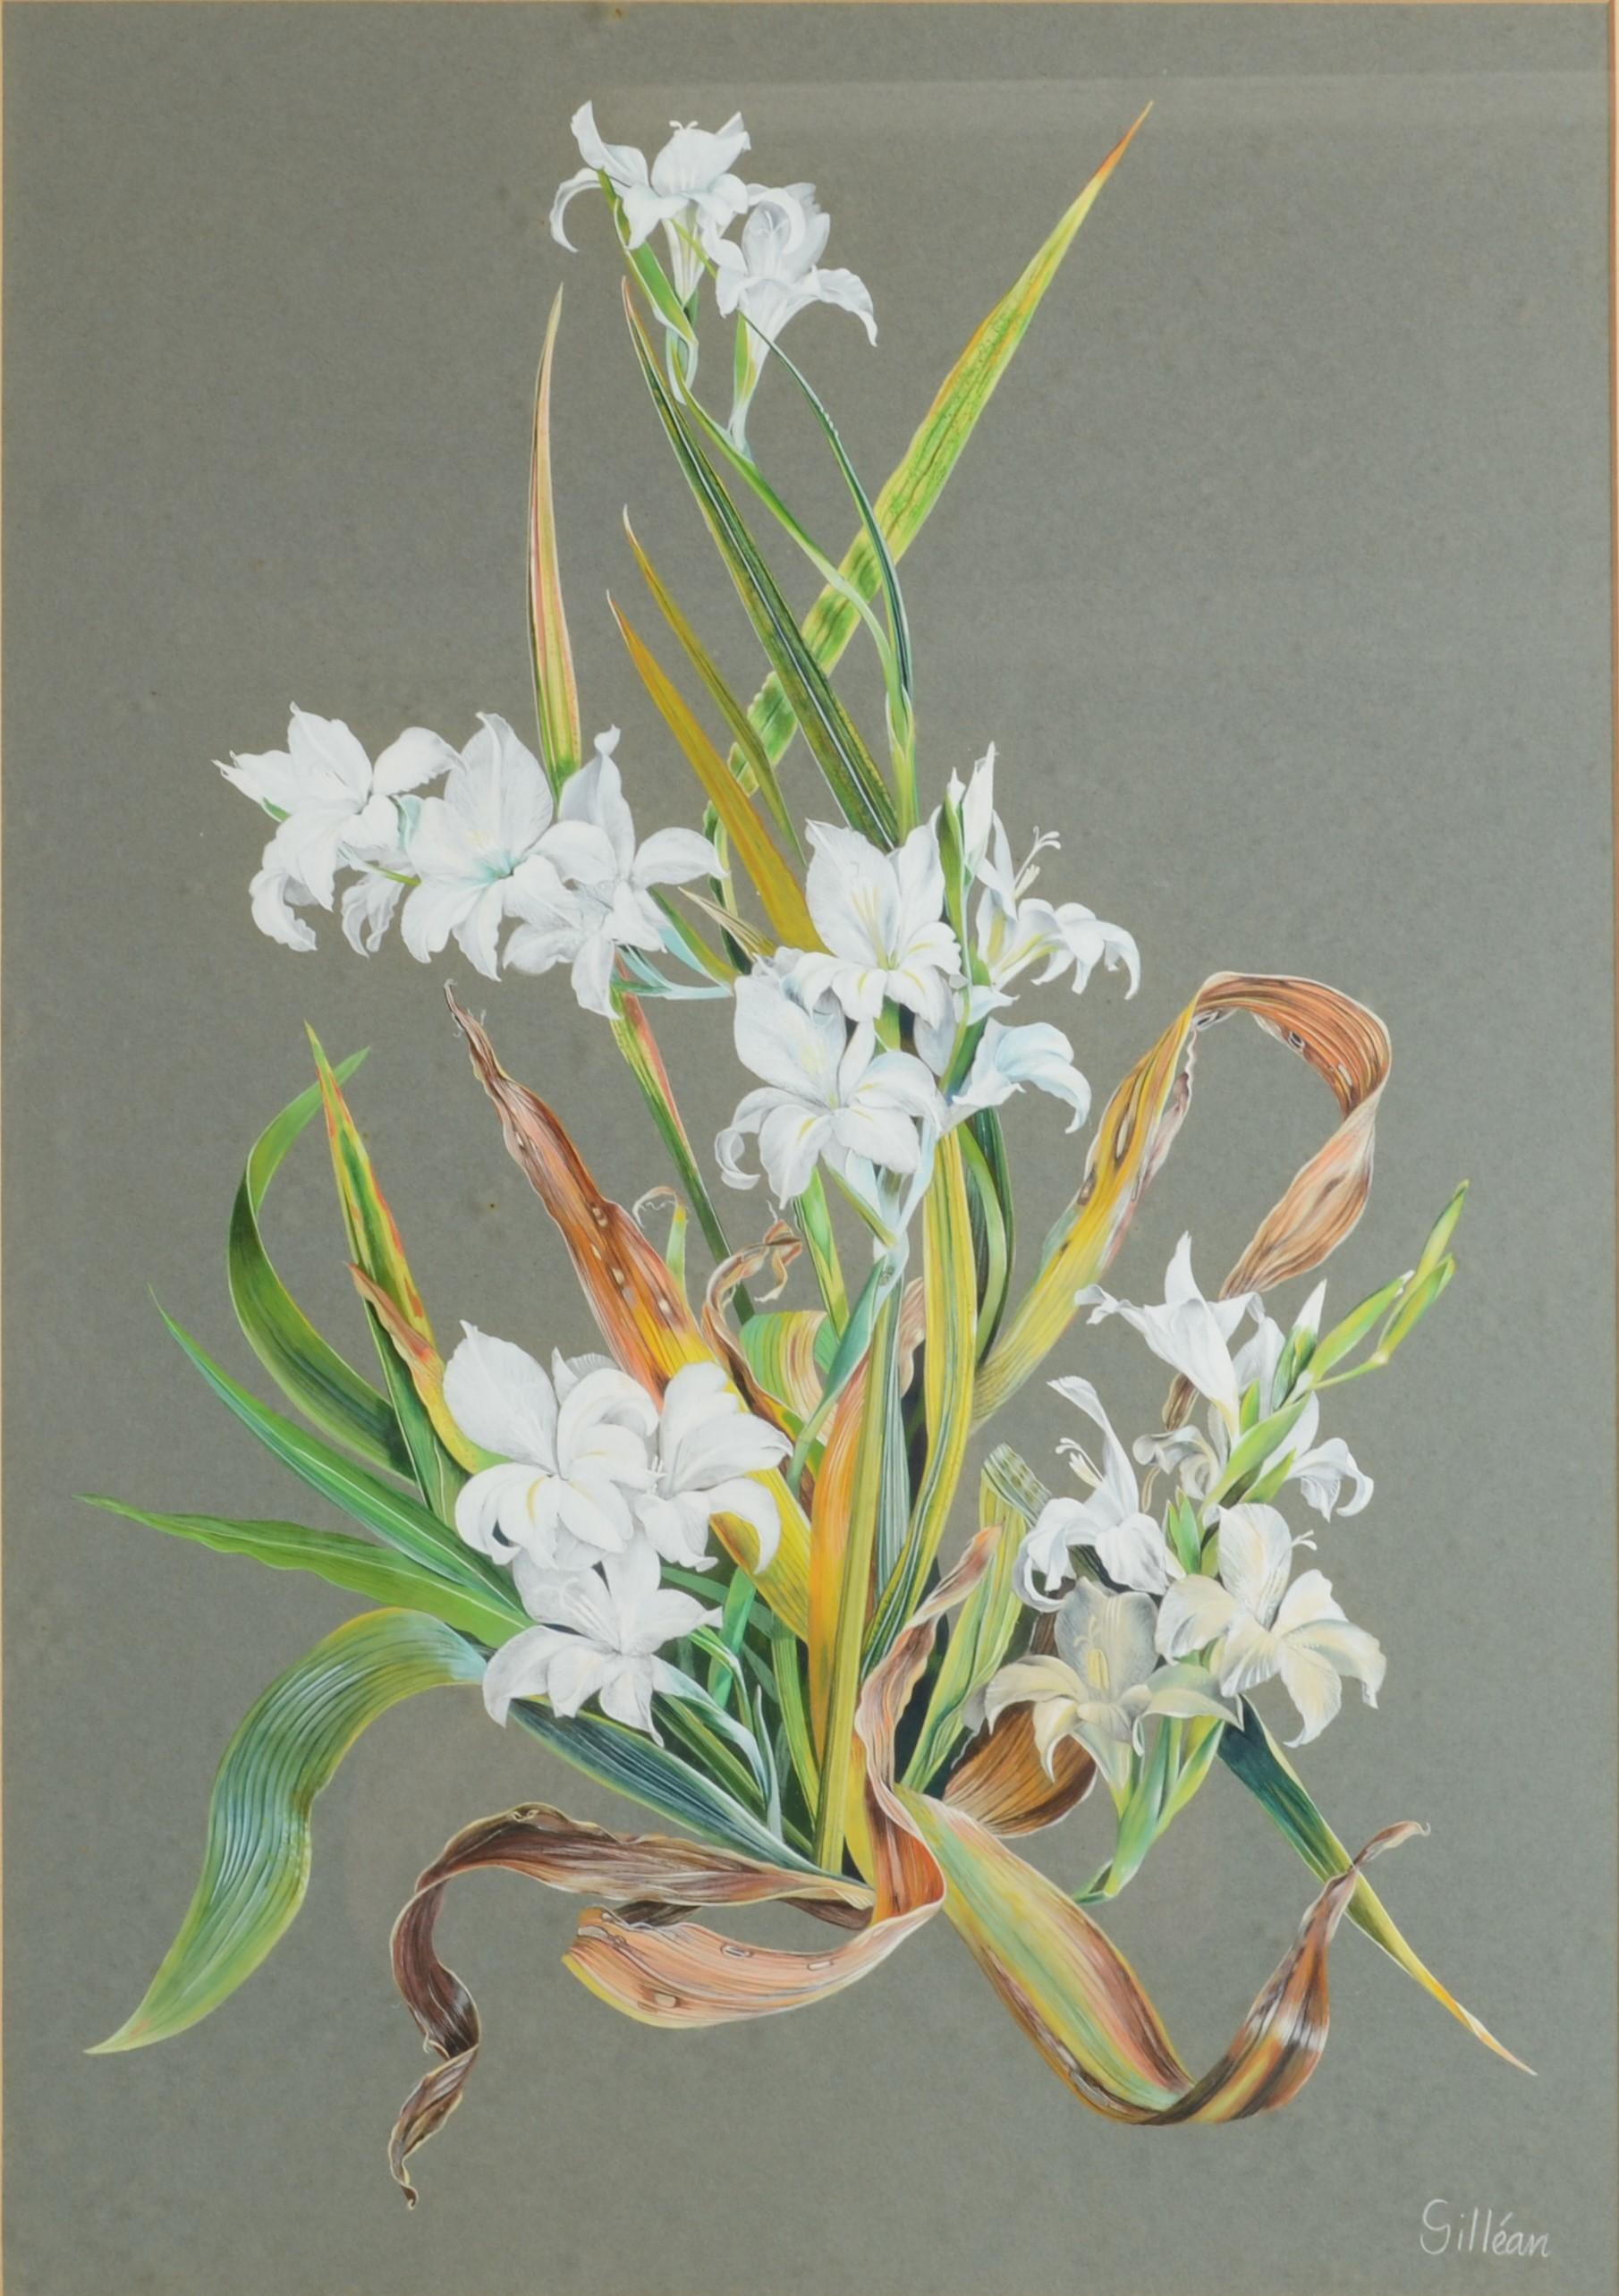 Lot 48 - GILLEAN WHITAKER Botanical Studies - a pair Watercolour Signed 63 x 45 cm